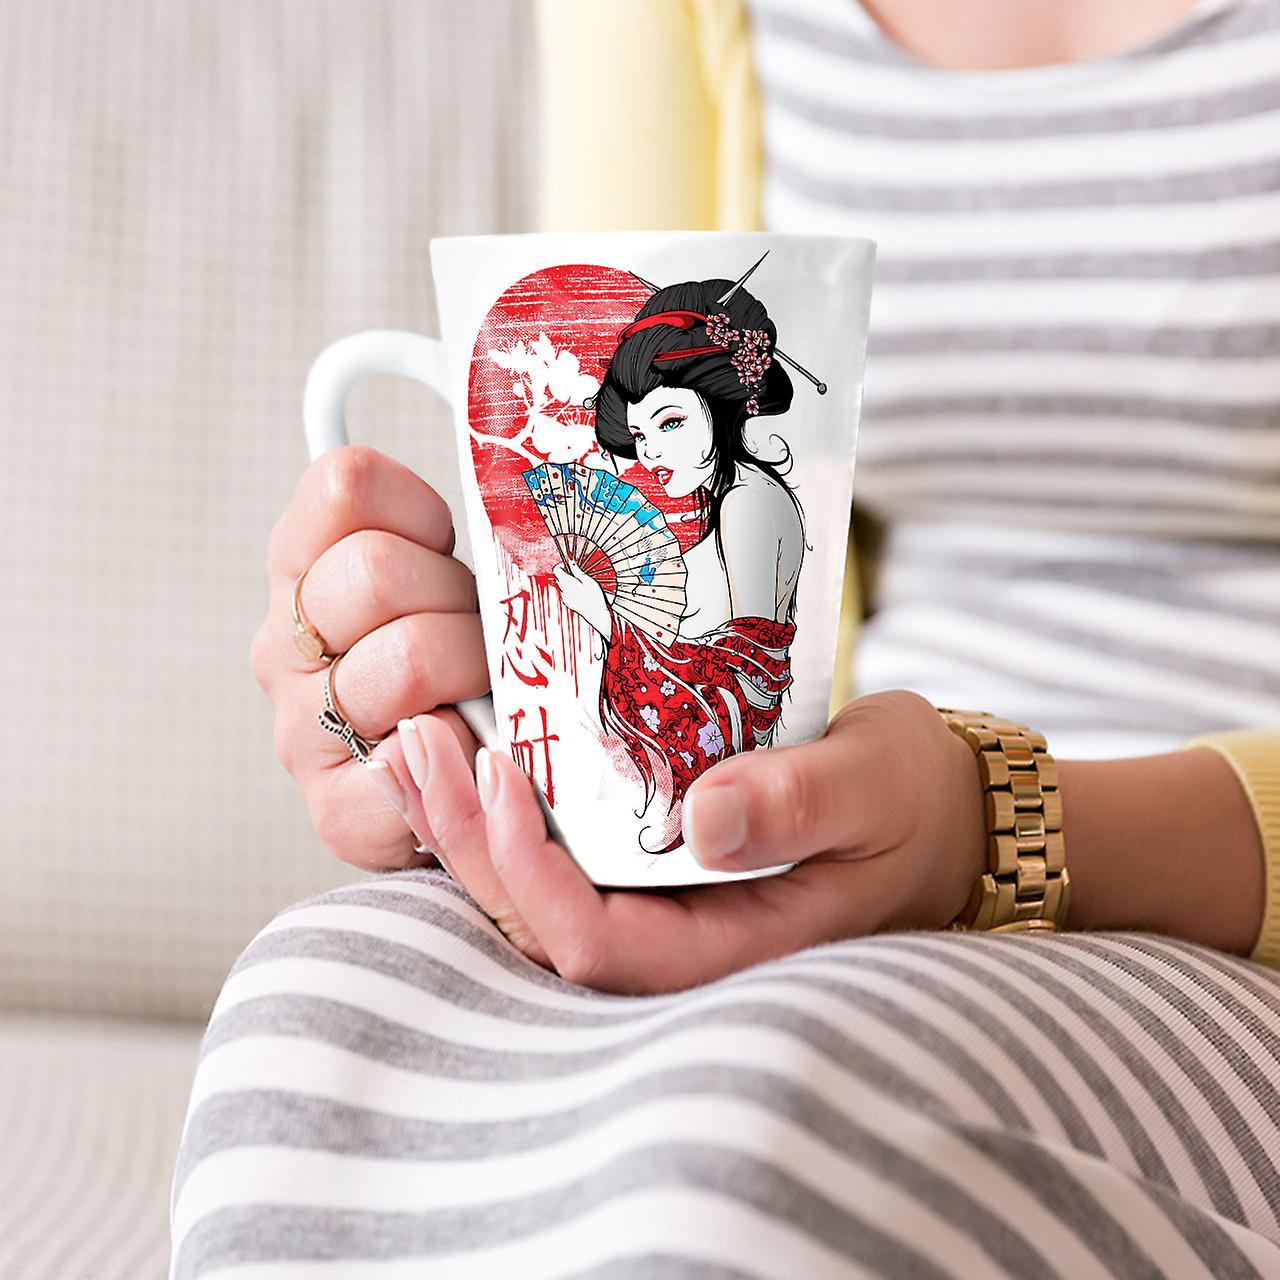 Japanische Verführer neuer weißer Tee Kaffee Keramik Latte Becher 17 oz | Wellcoda